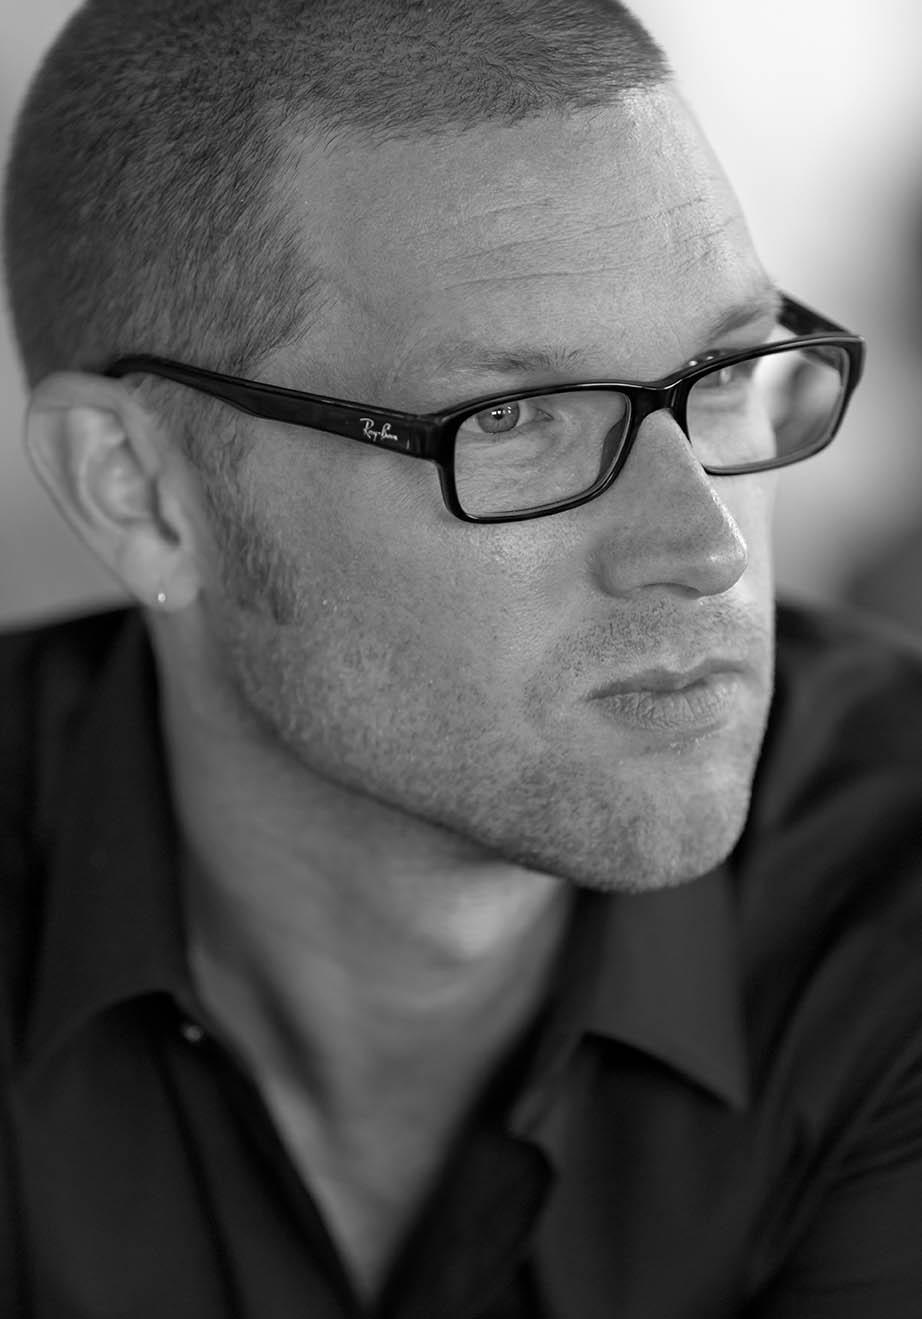 Jonas W. Rasmussen, Læsø Litteraturfestival 2014. Foto: Lars Gundersen